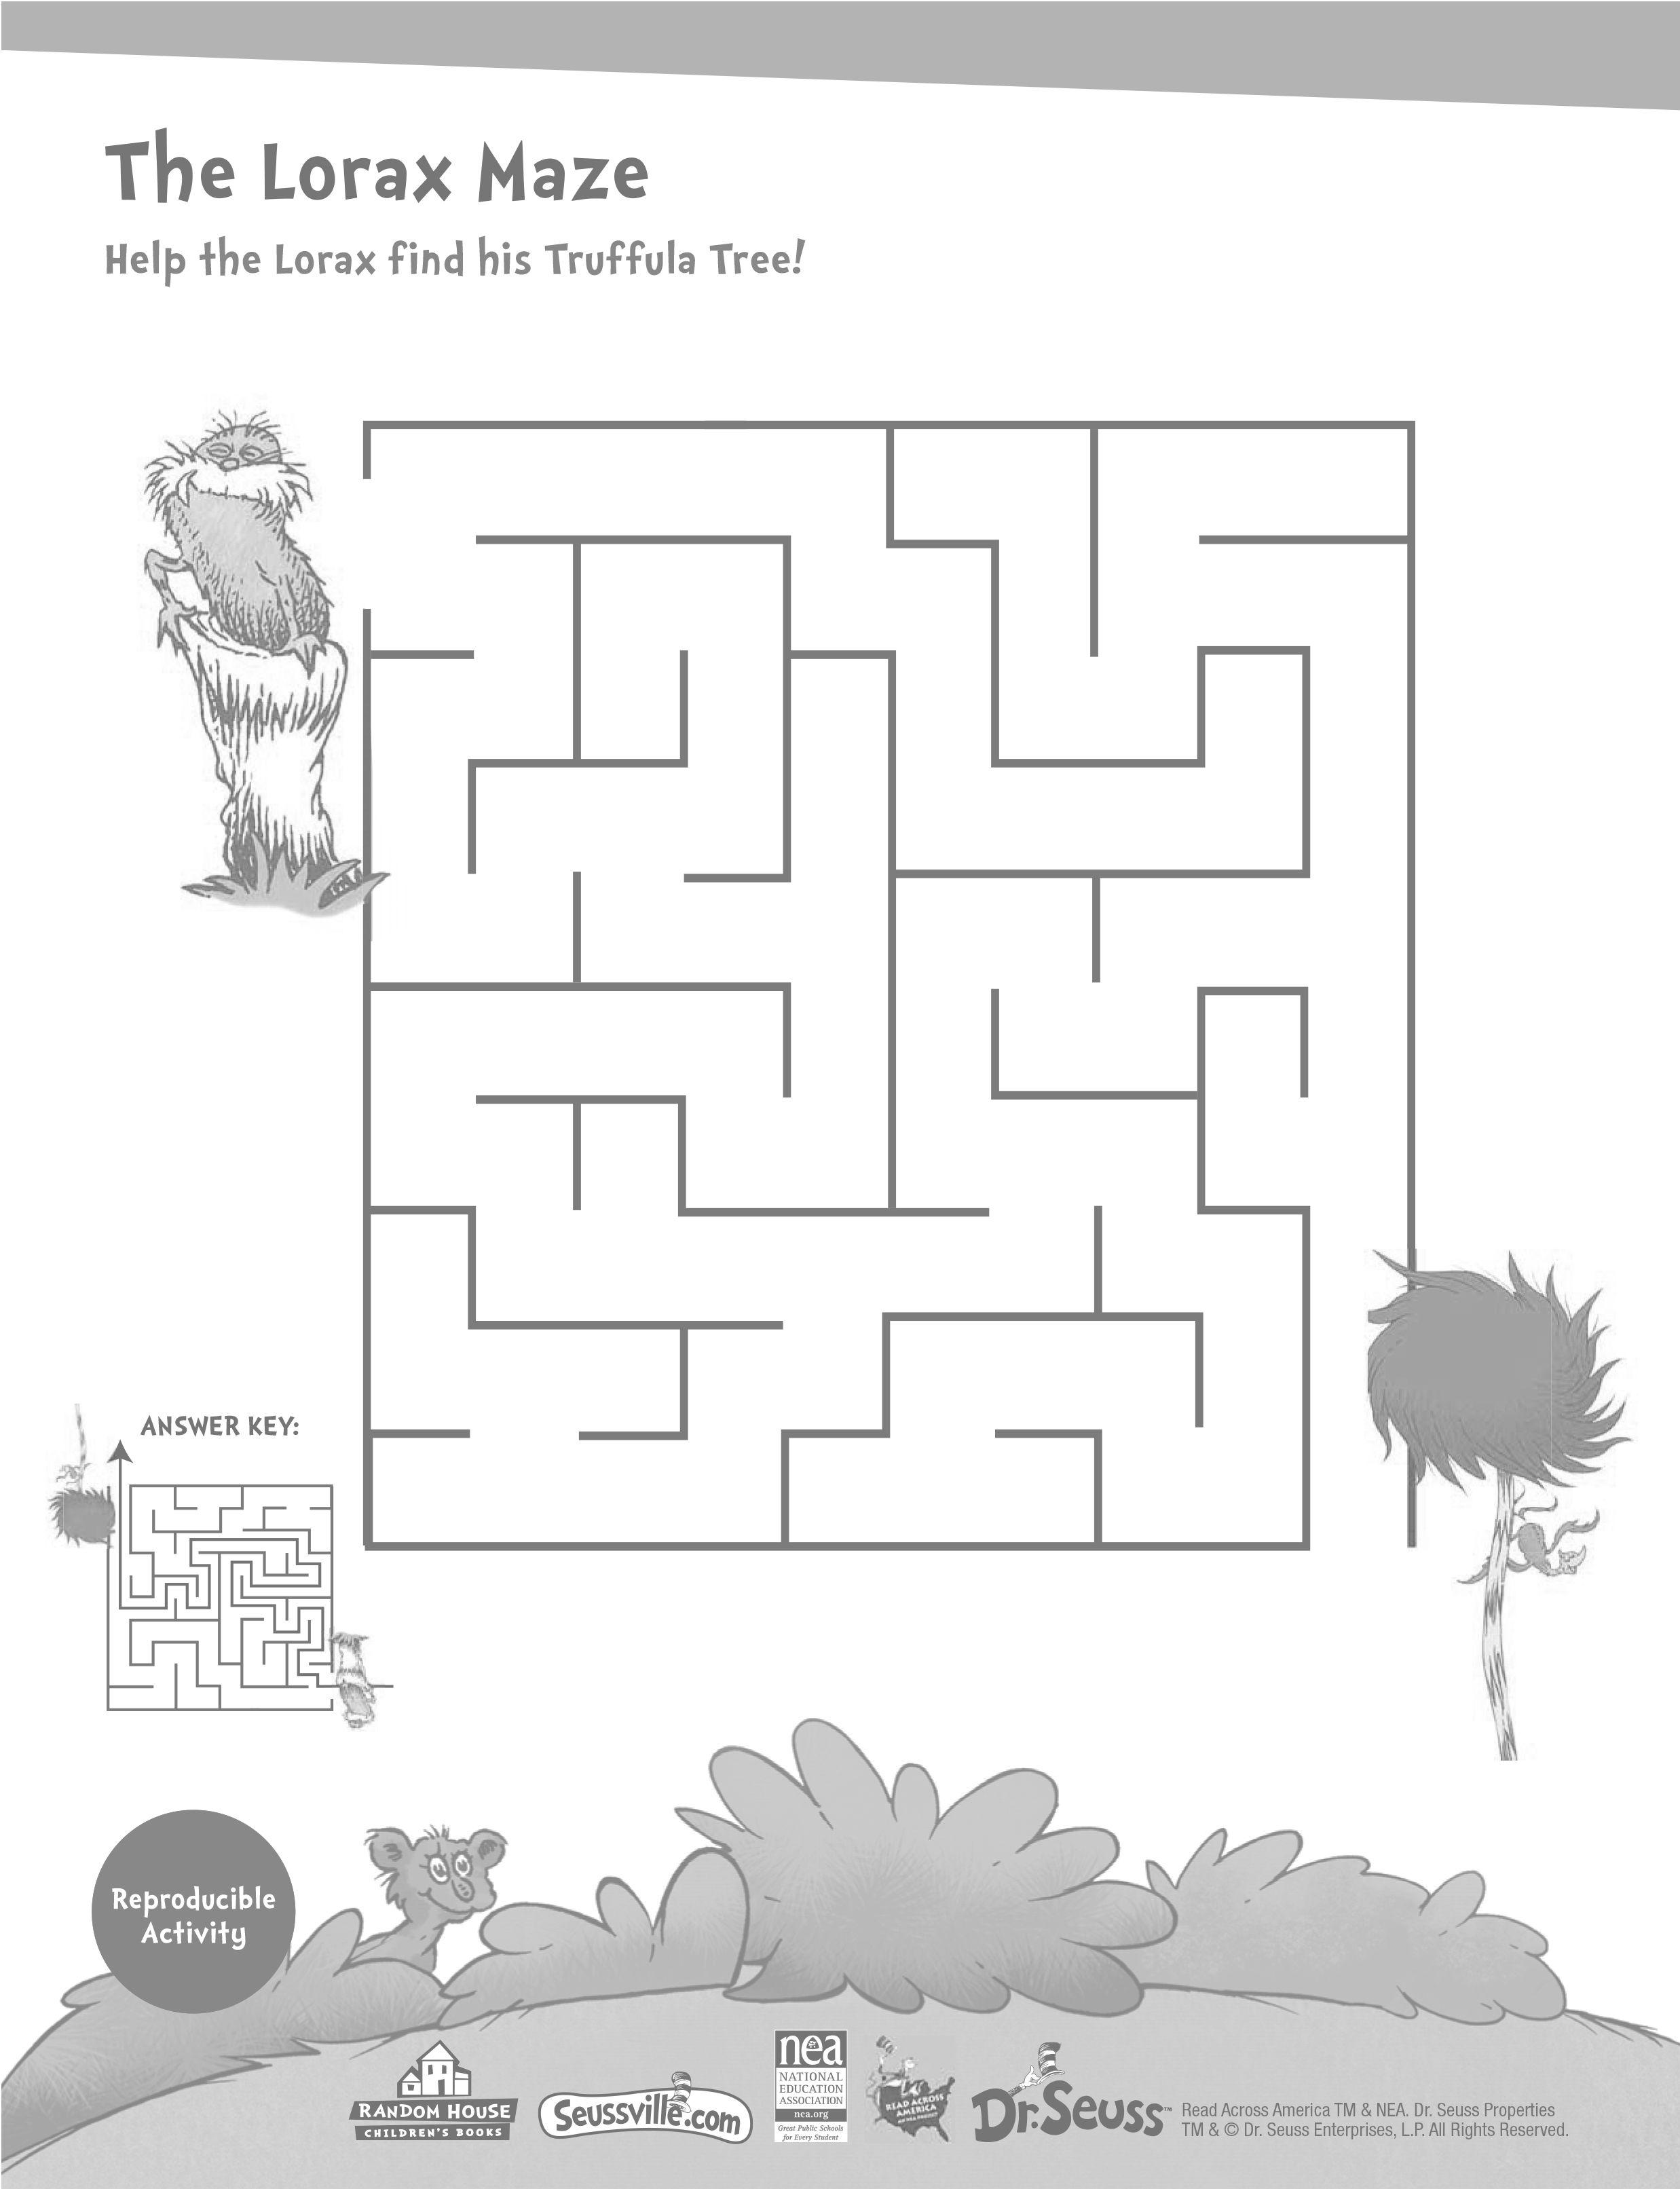 Dr Seuss Lorax Maze For Earth Day Earthday Lorax